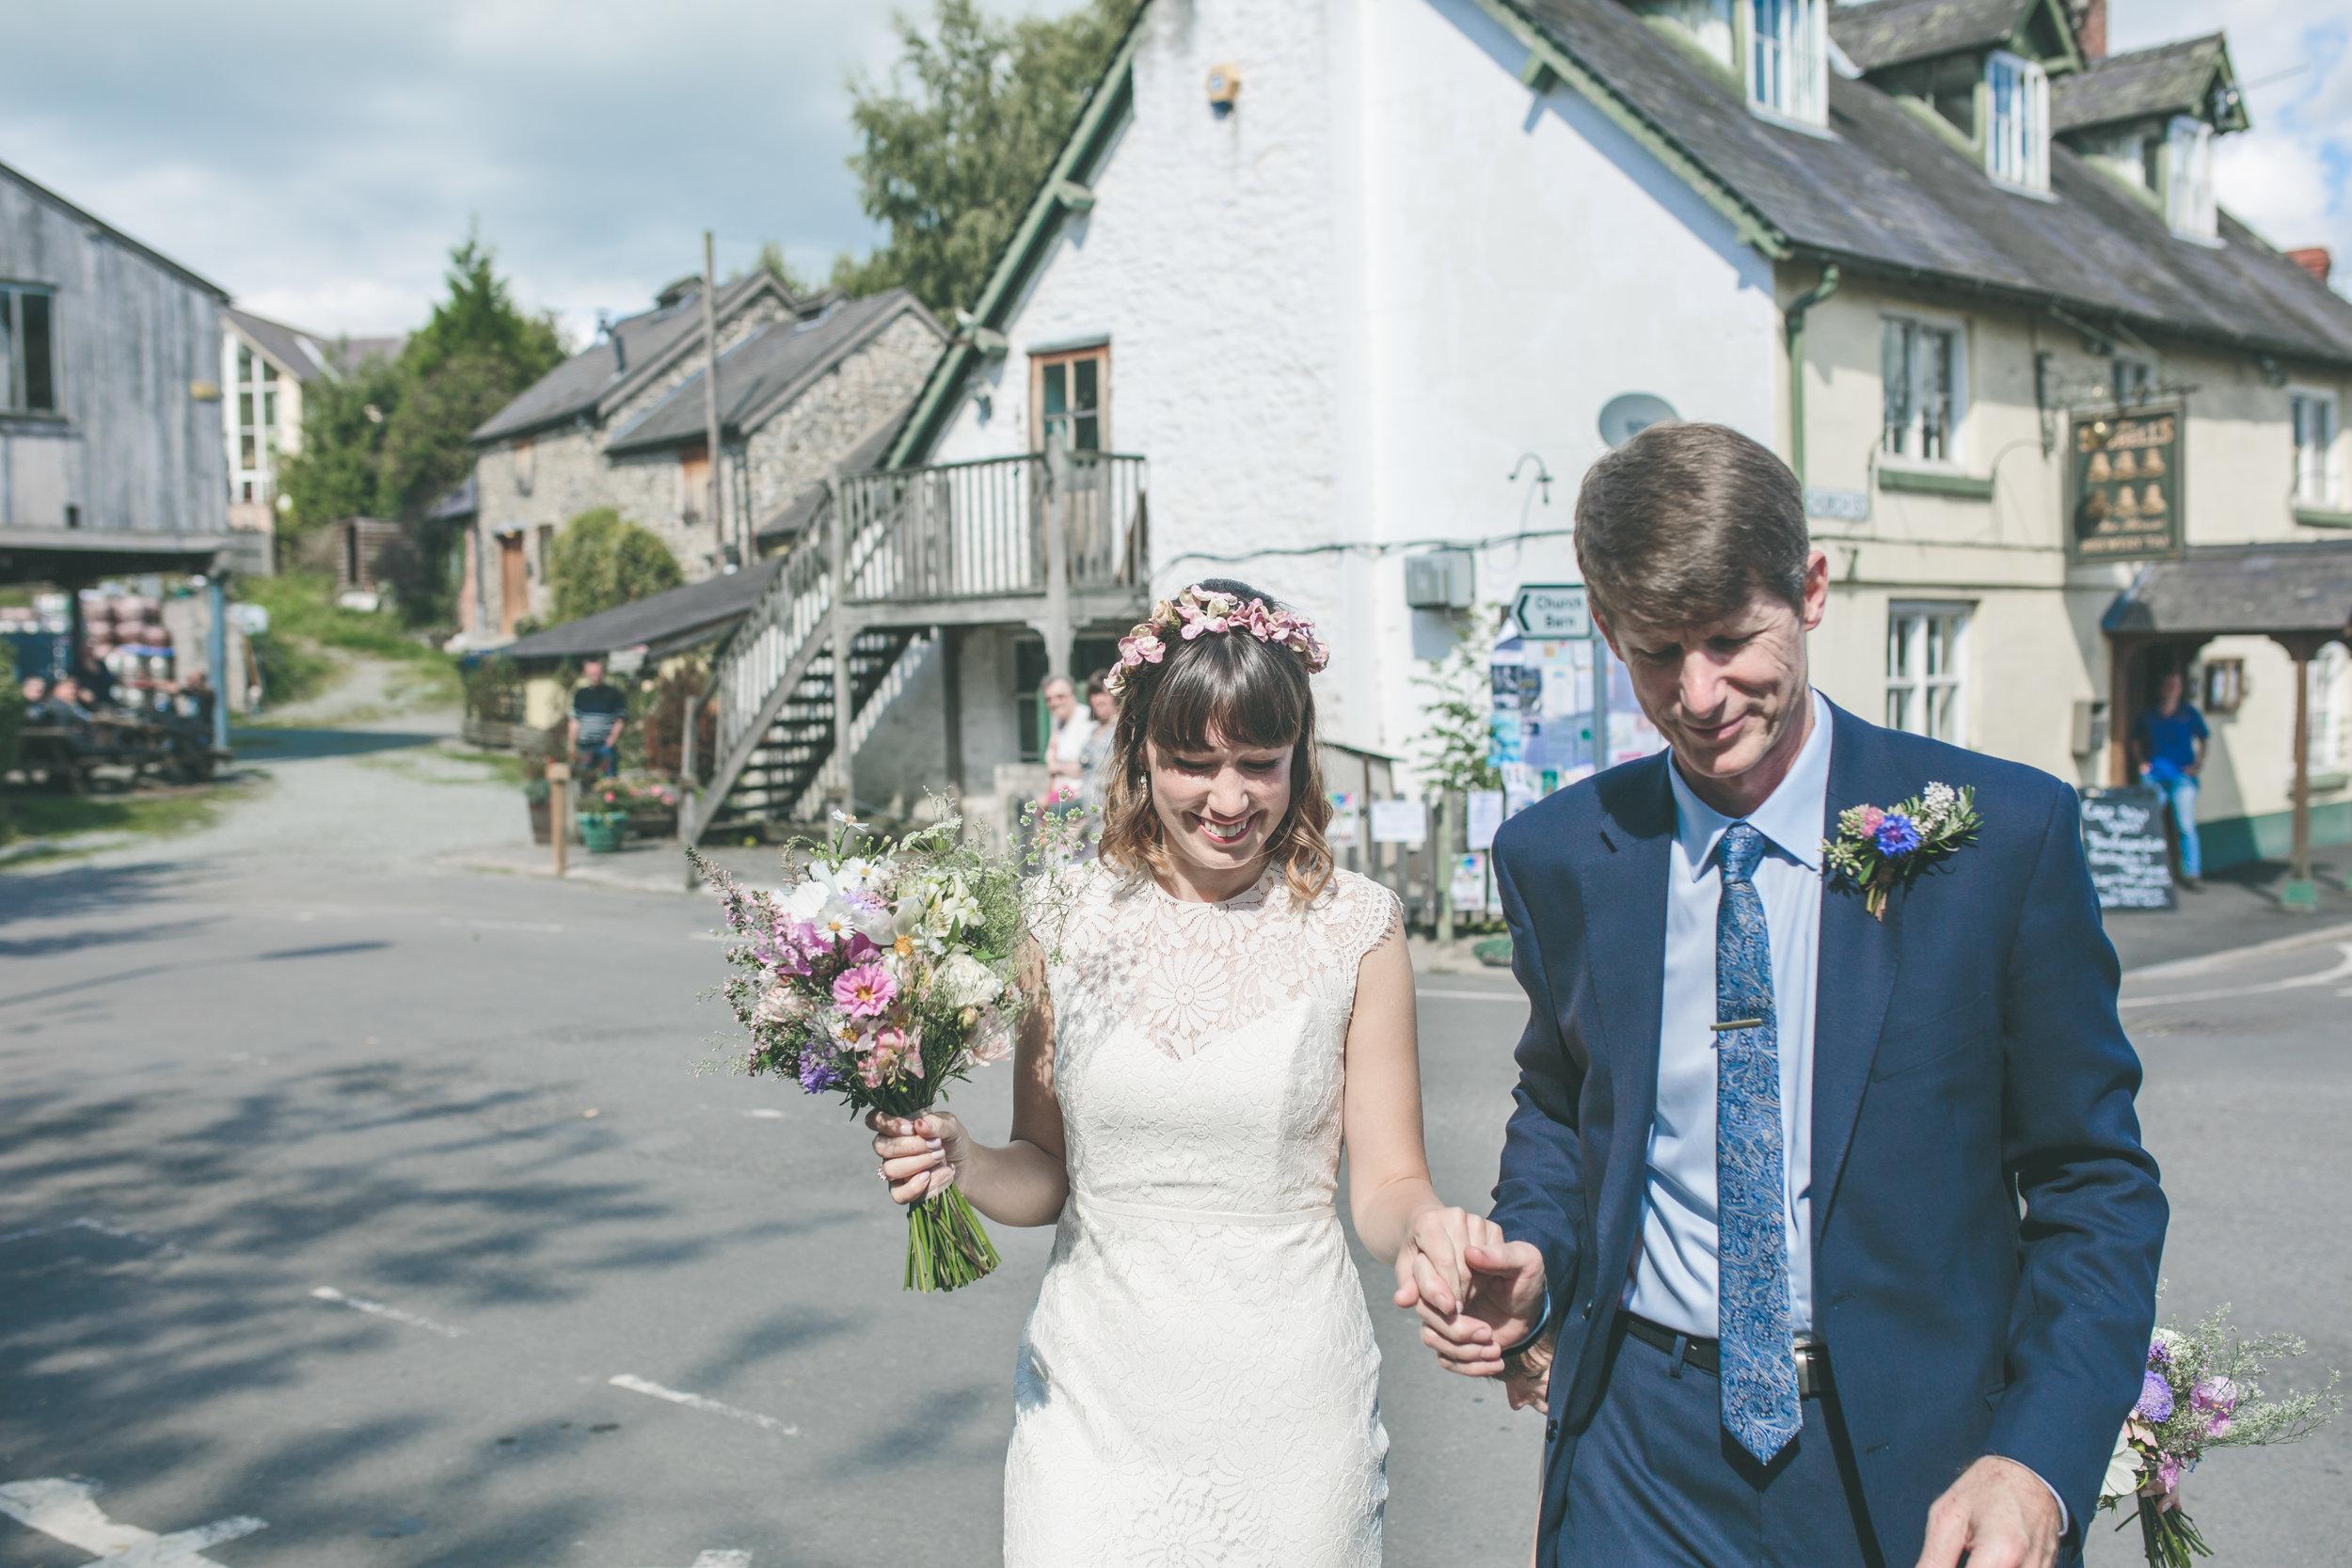 Walcot_Hall_Wedding_Photography_Jesse_Rose_-169.jpg